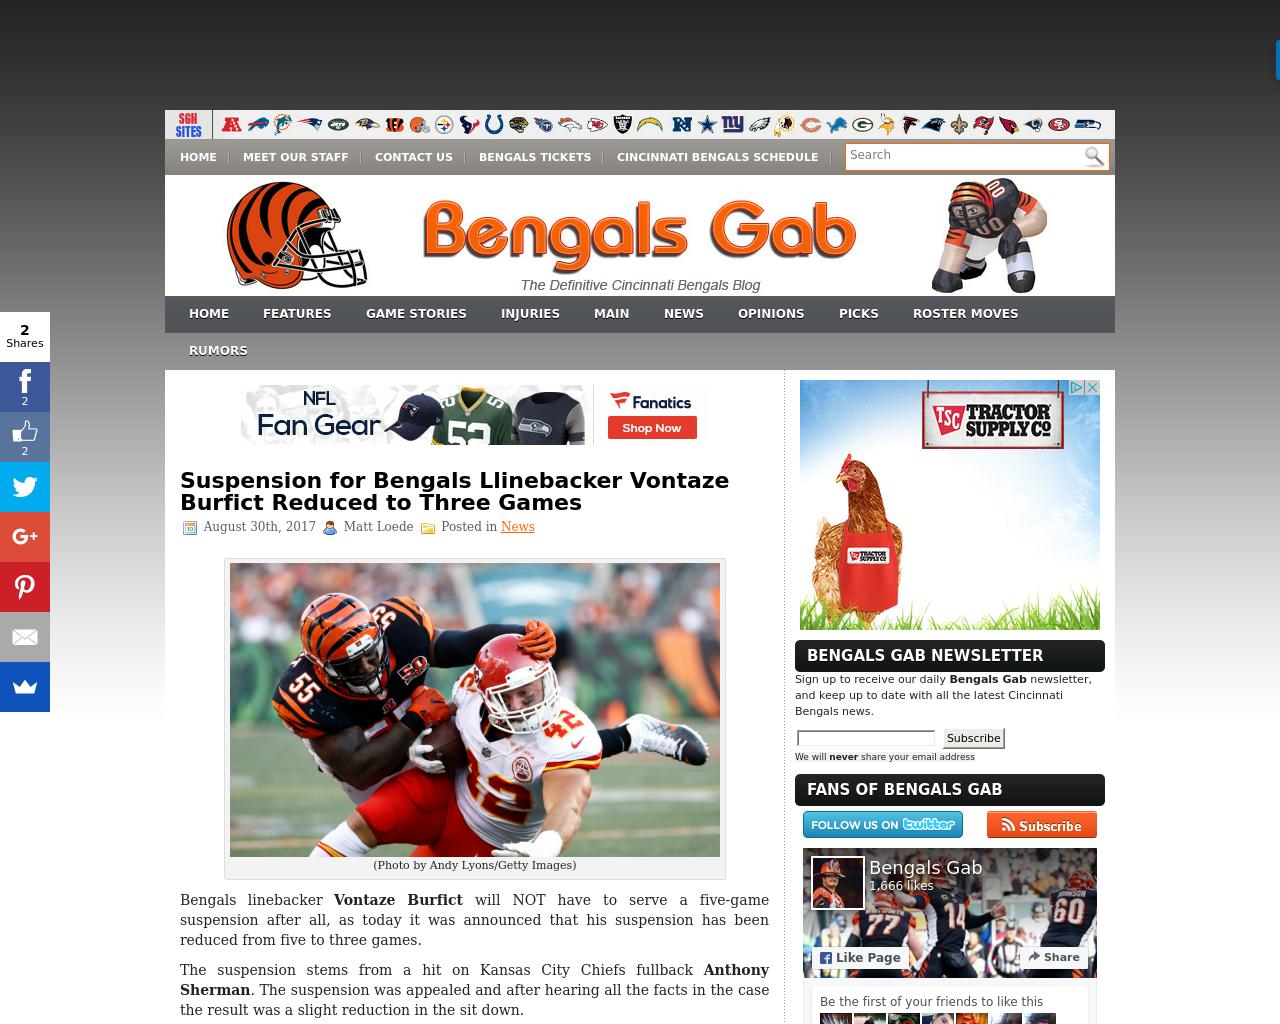 Bengals-Gab-Advertising-Reviews-Pricing